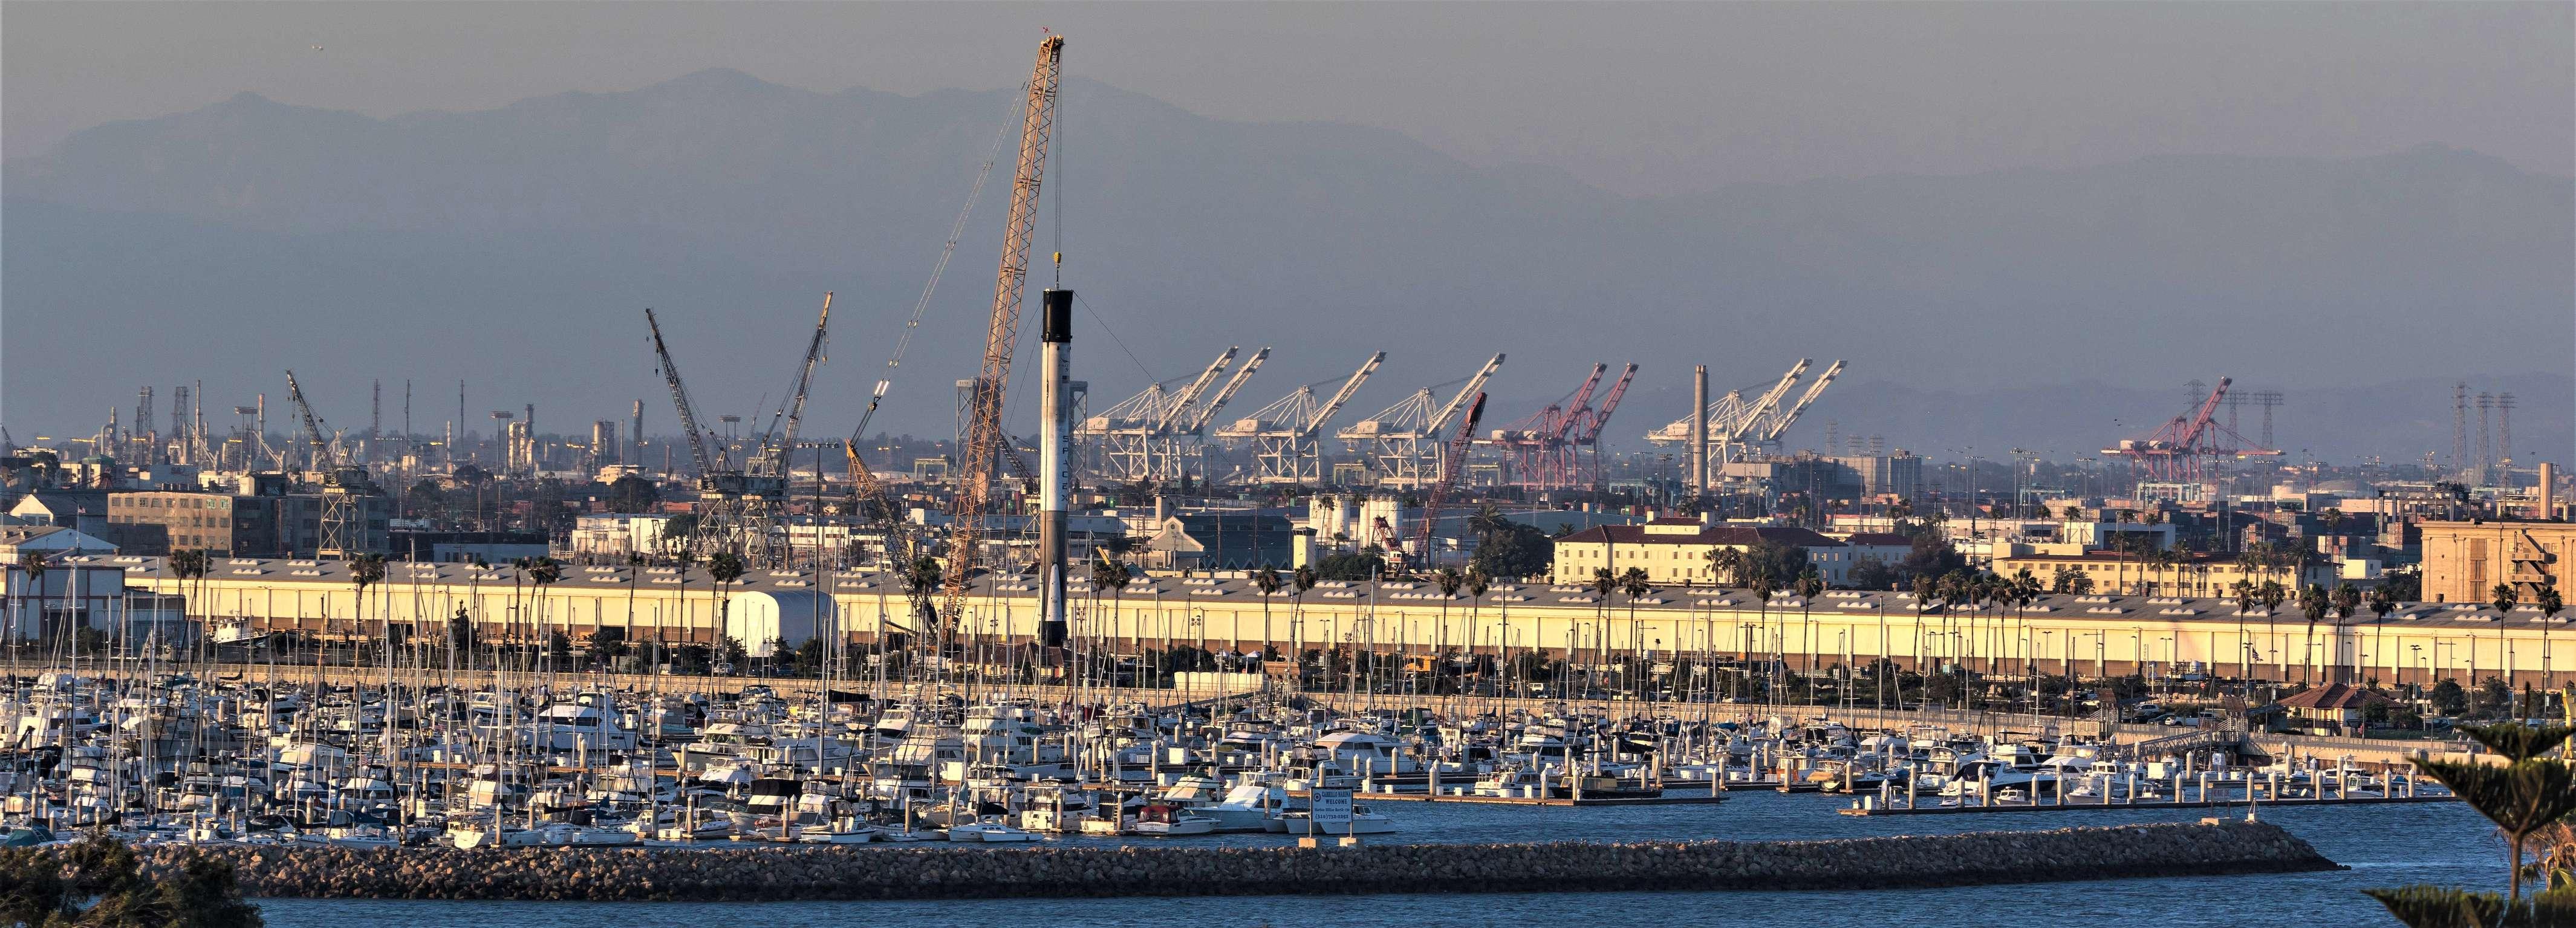 F9 B1048 Port of LA overview (Pauline Acalin) (1)(c)